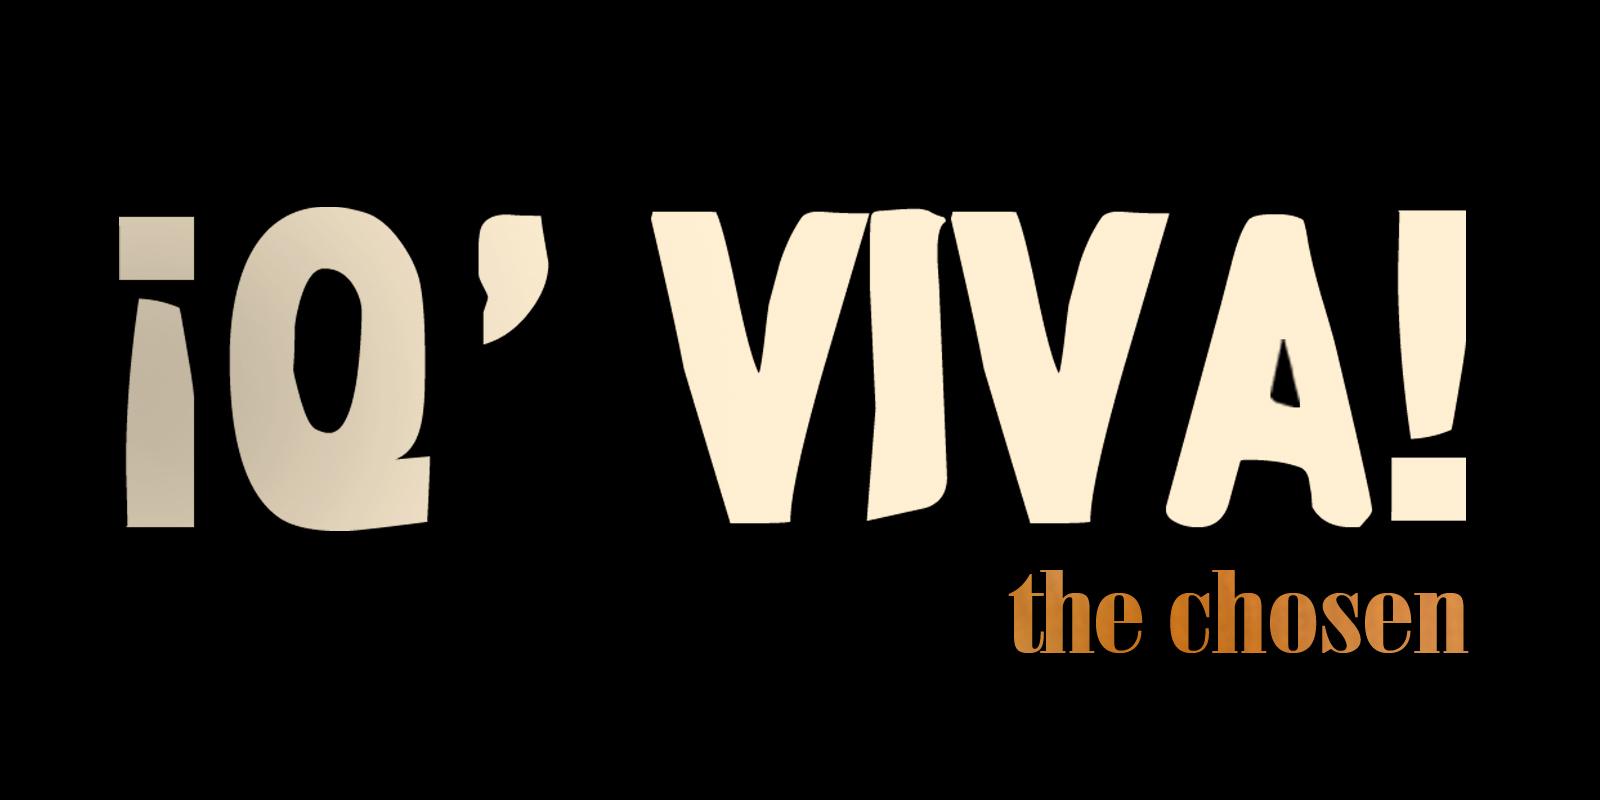 http://4.bp.blogspot.com/-o8HTf_szHcA/TeZQfhZxEYI/AAAAAAAAKic/5Wn5_HQCrPg/s1600/QViva_logo_final.jpg